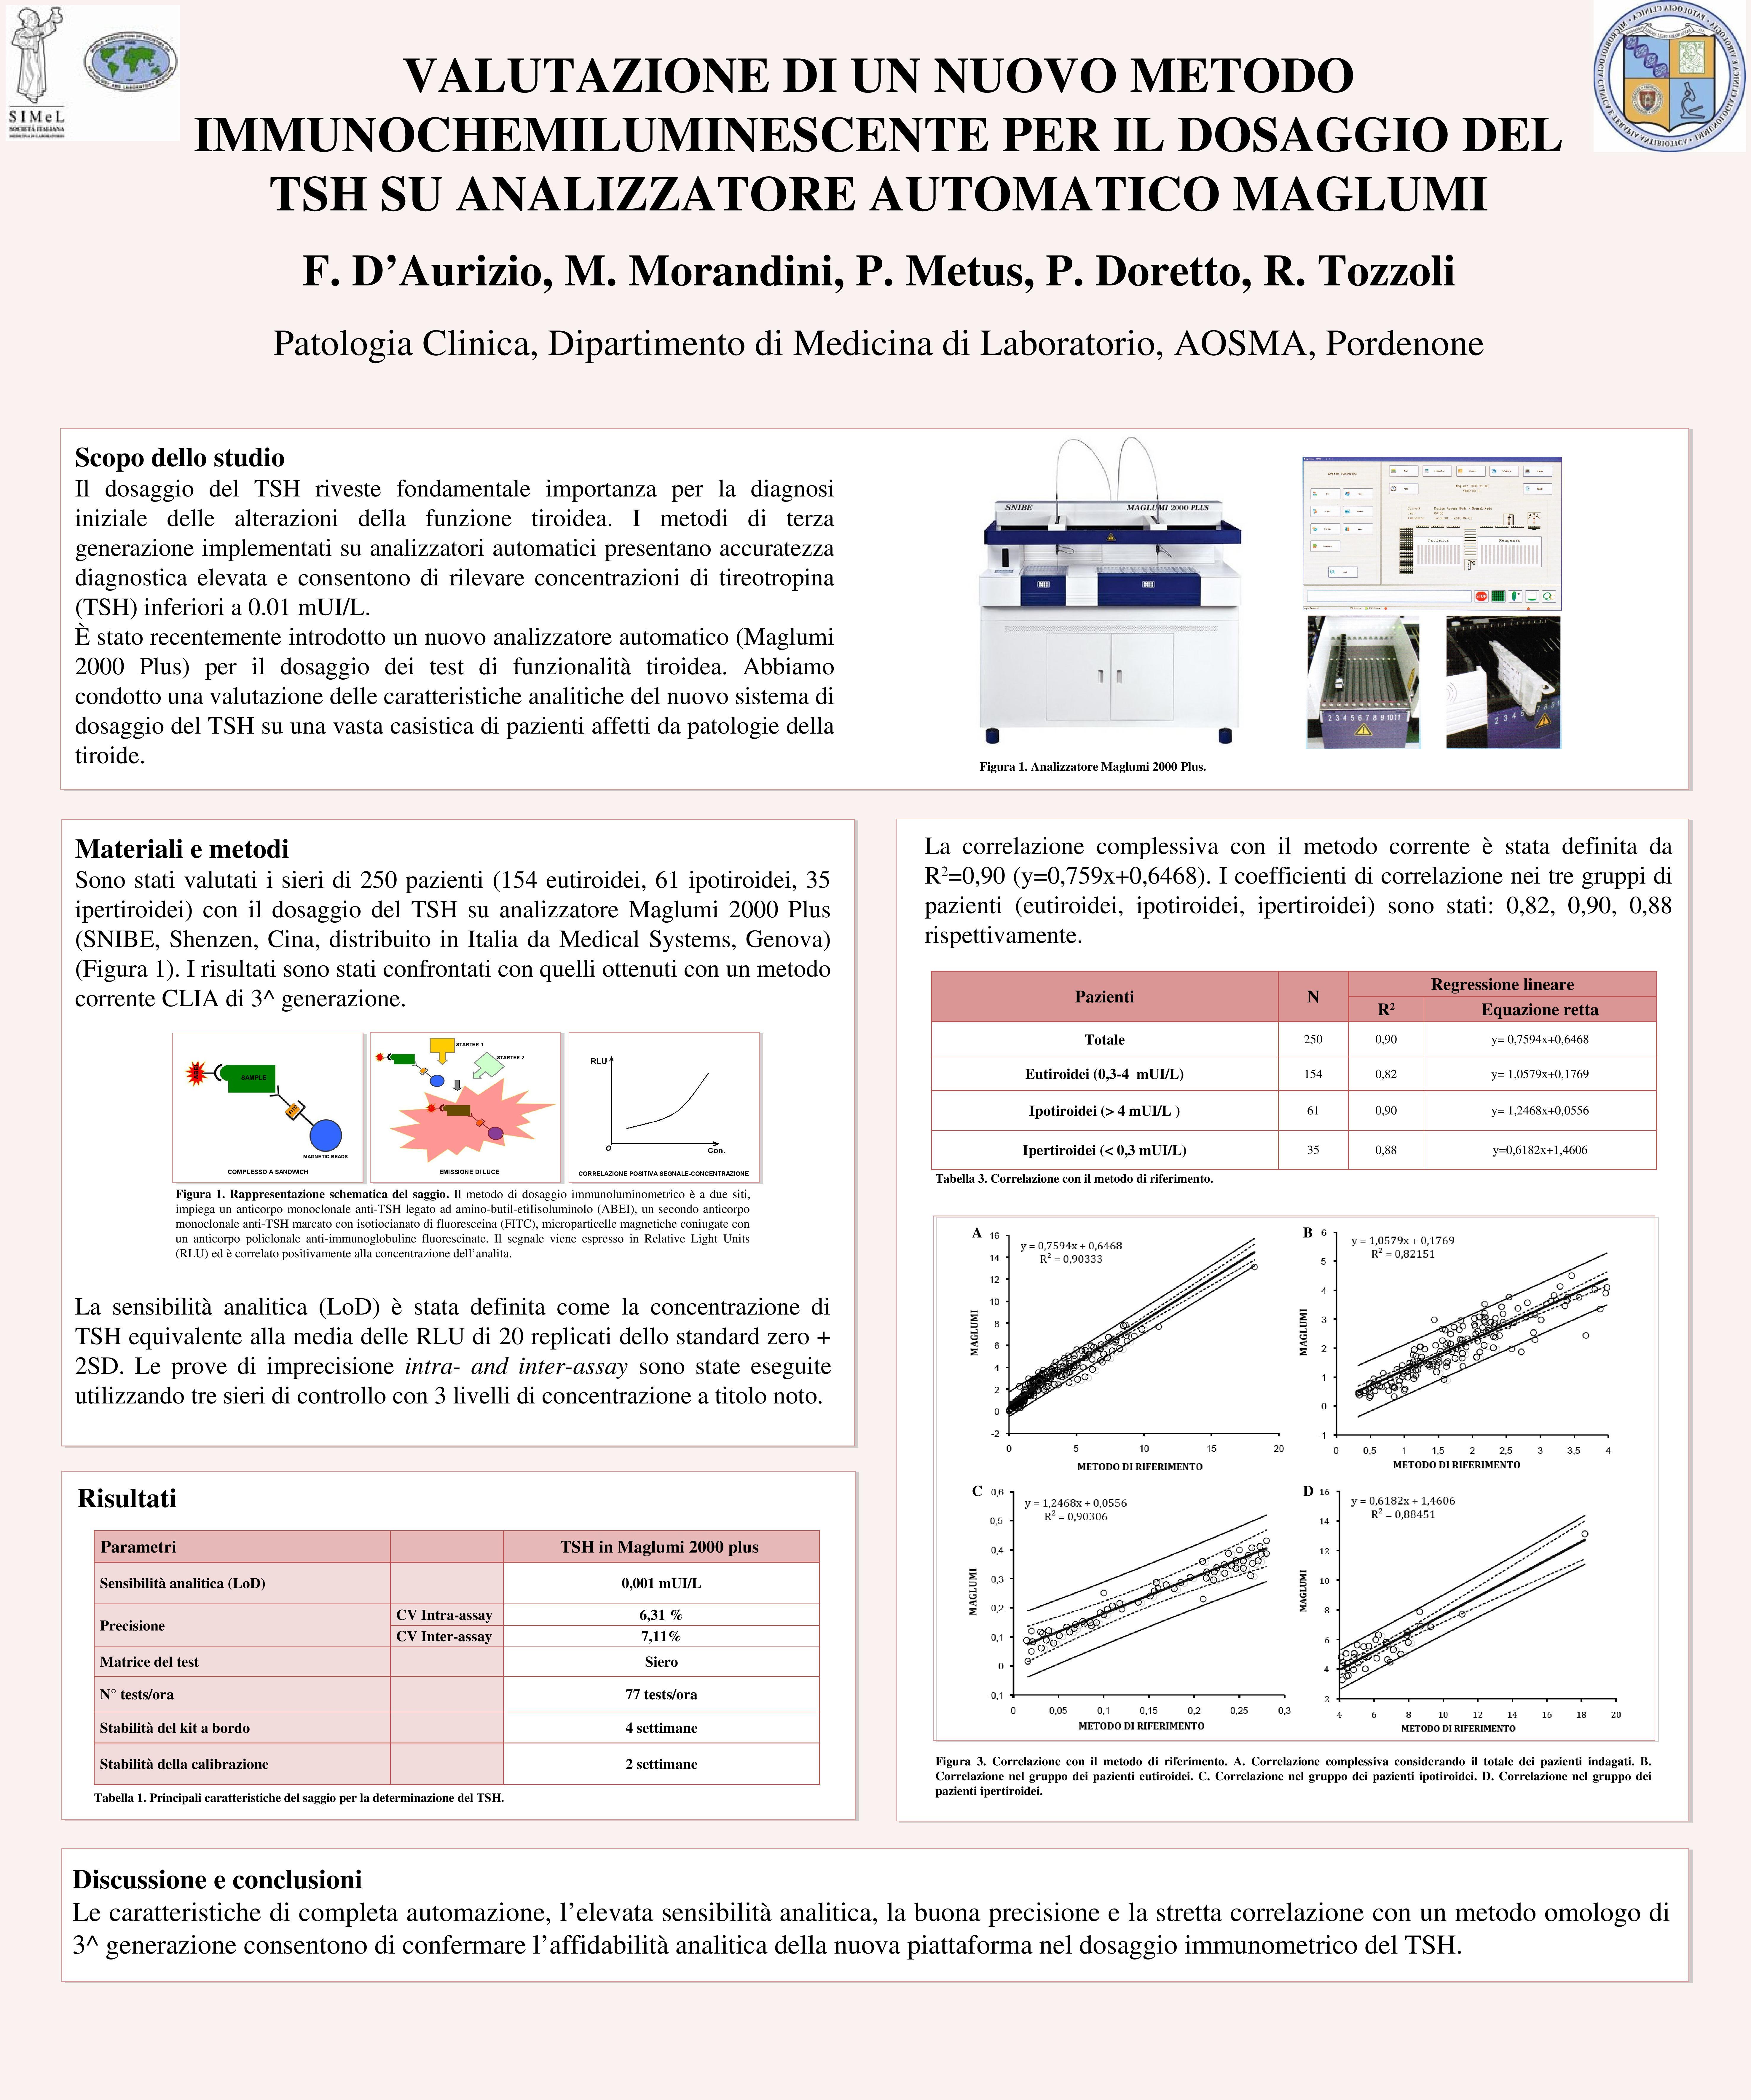 MAGLUMI TSH, Poster 088 SIMeL 2012, DAurizio et al-page-001